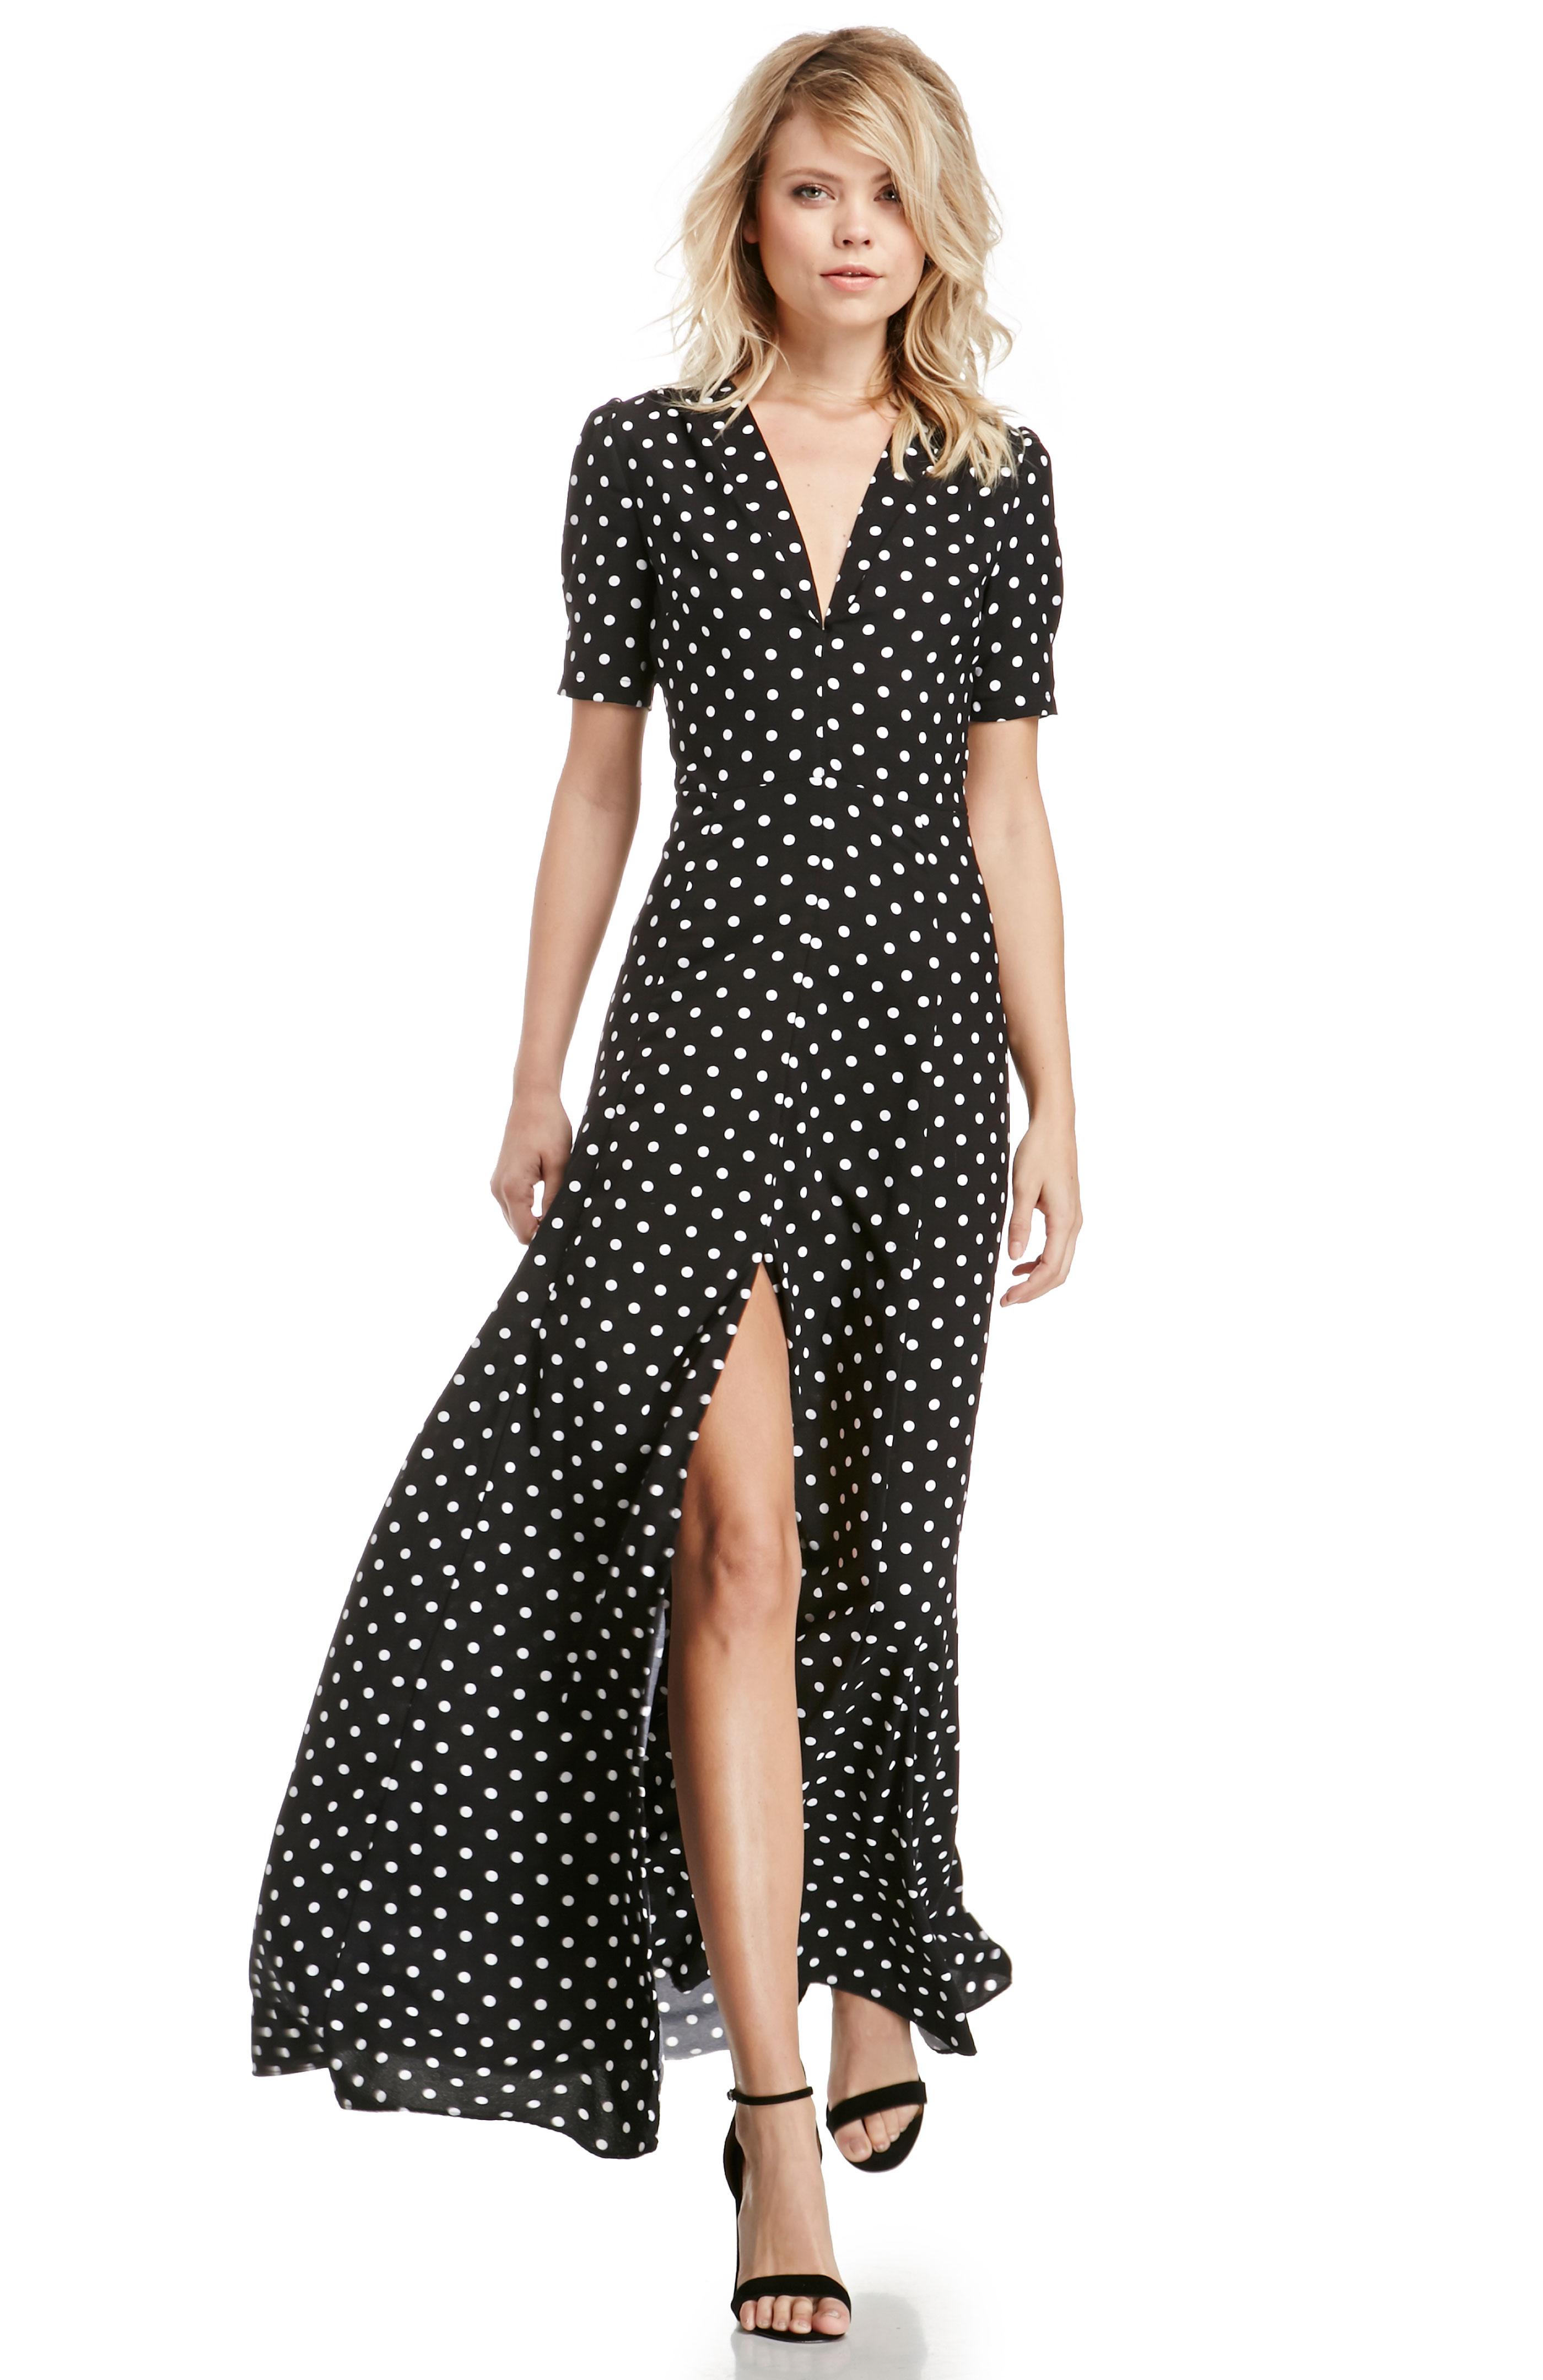 DAILYLOOK Sultry Polka Dot Maxi Dress in Black / White | DAILYLOOK